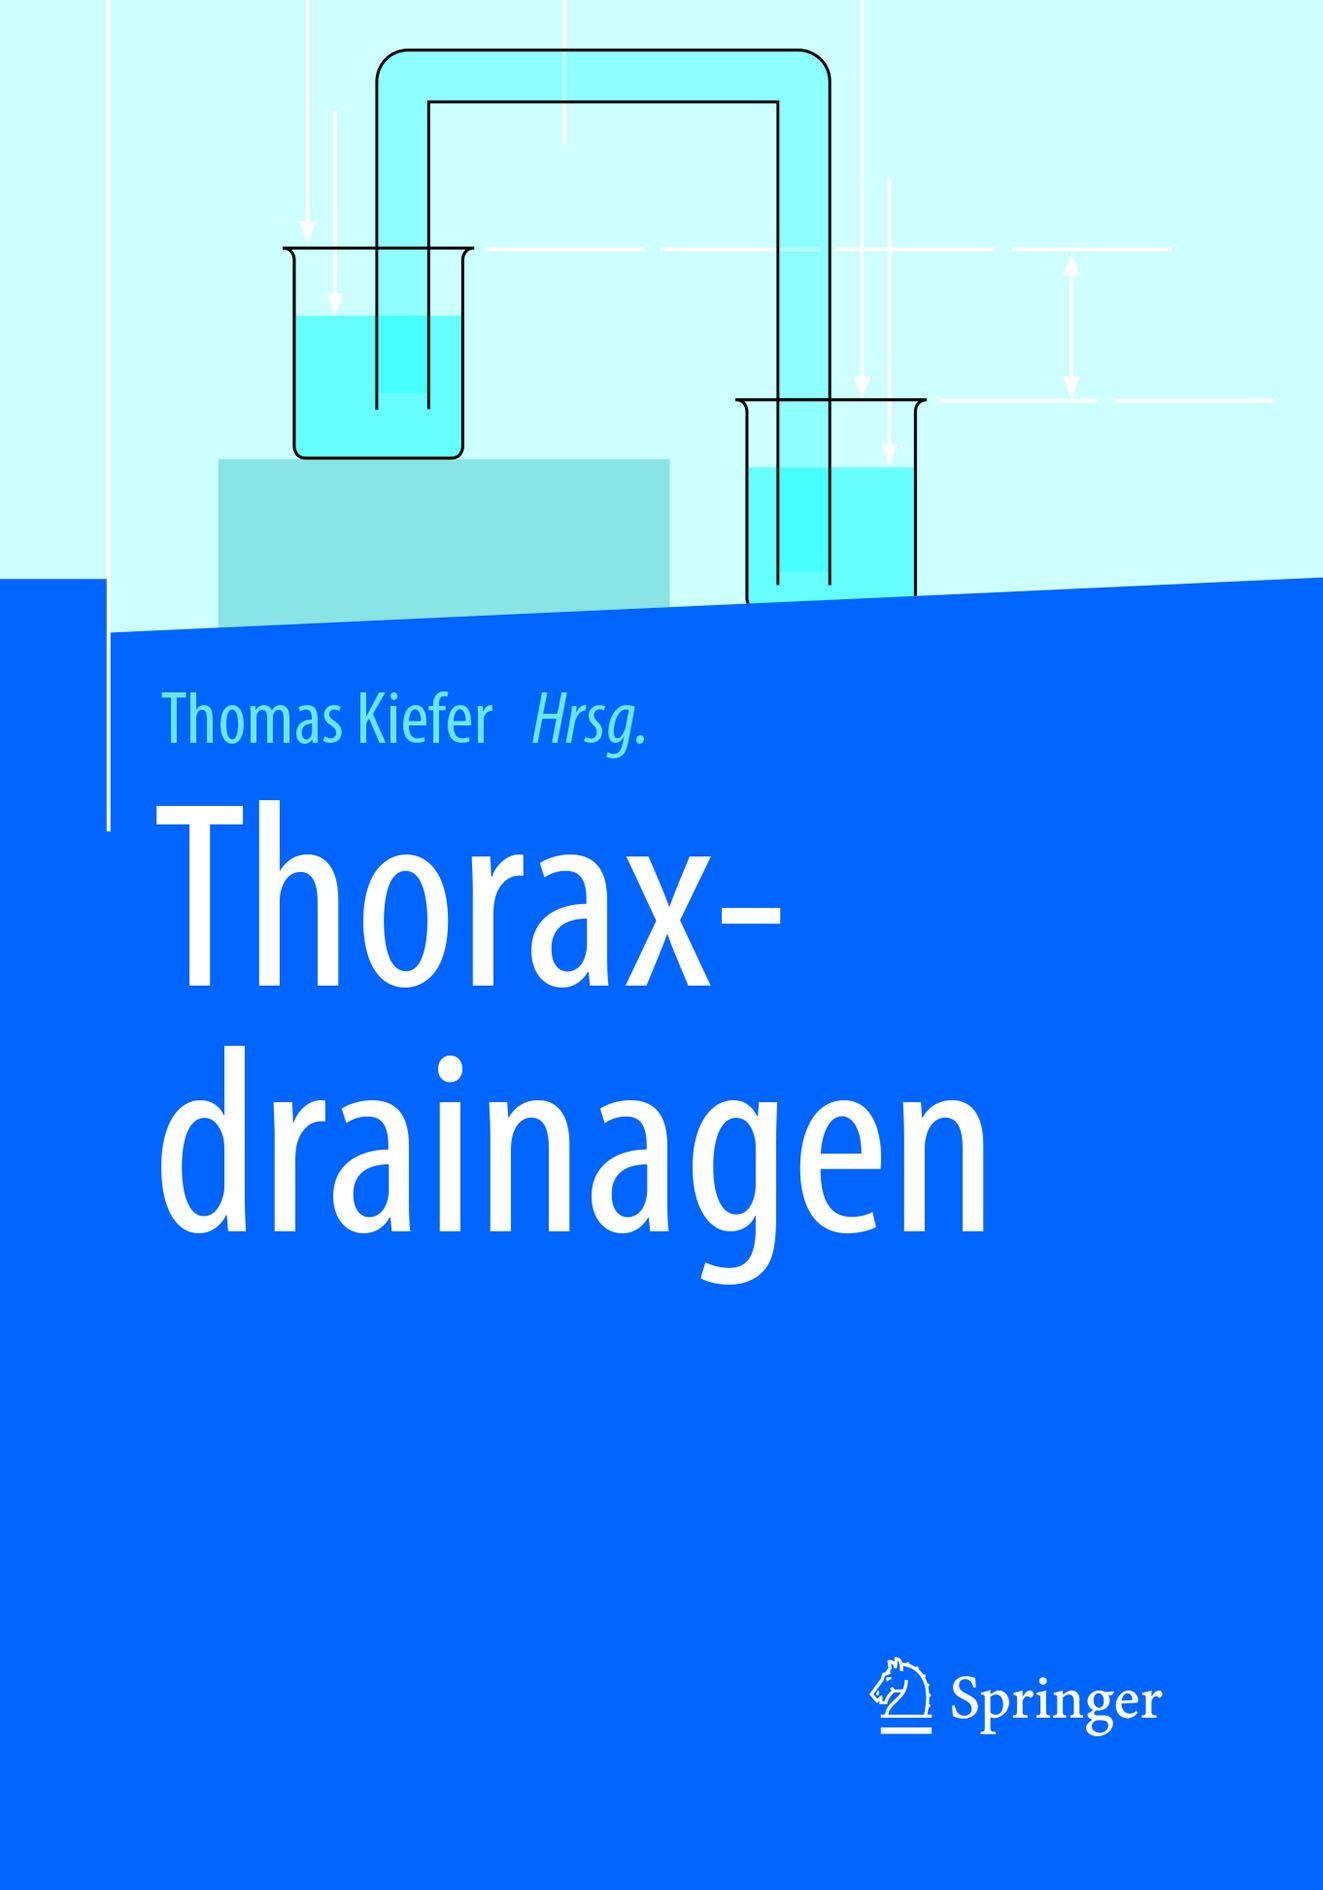 Kiefer, Thomas - Thoraxdrainagen, ebook